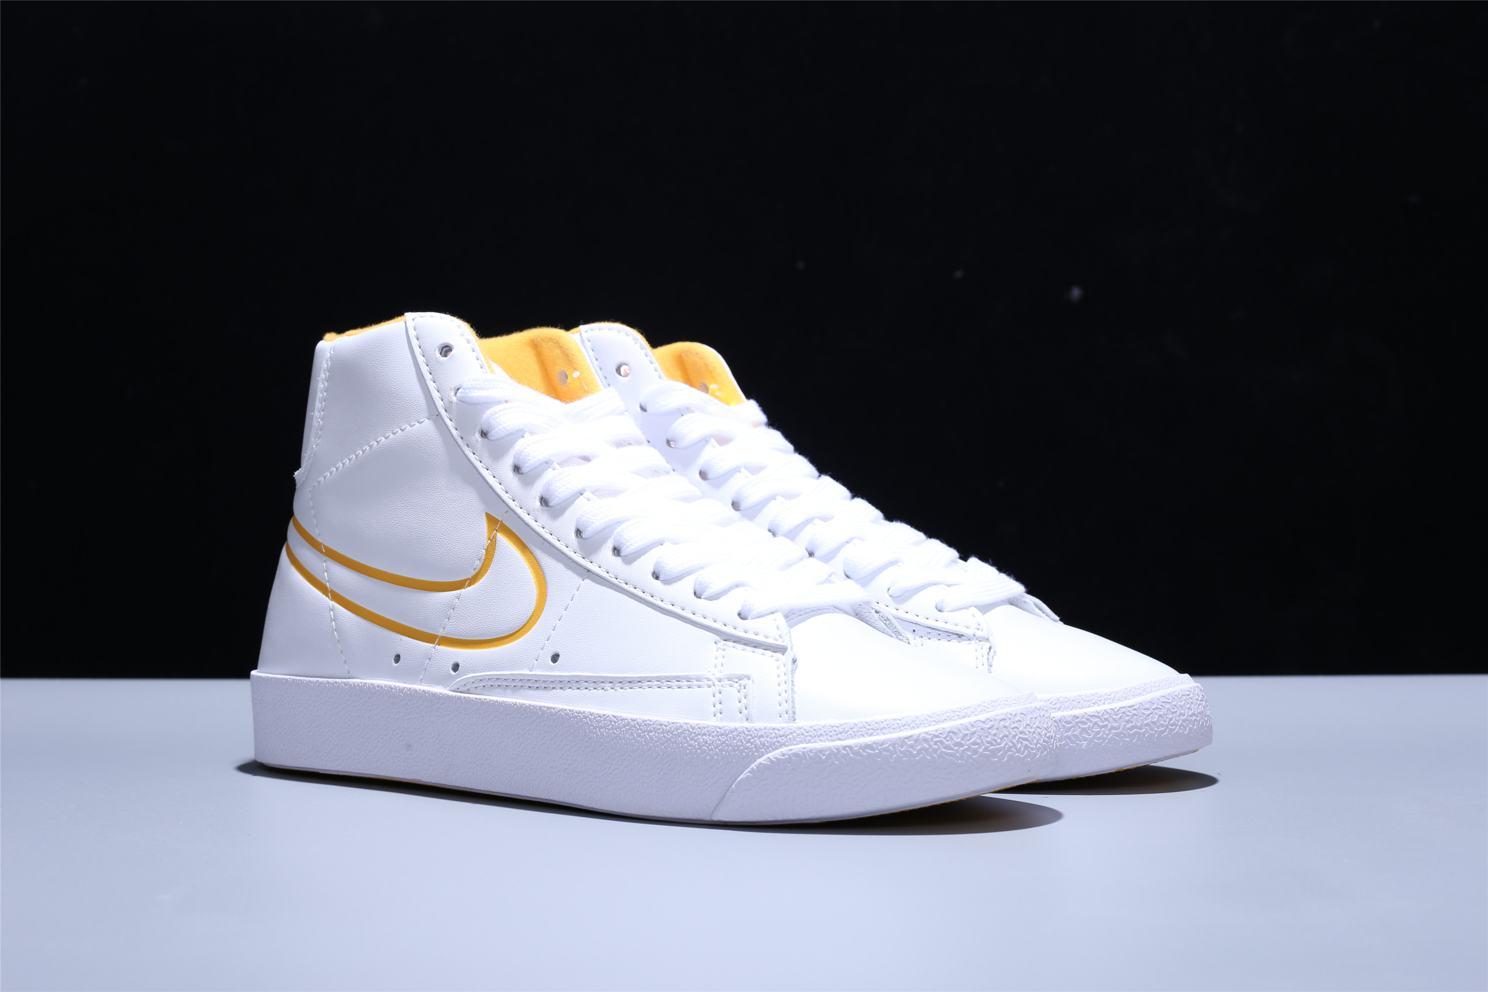 Nike Blazer Mid White Topaz Gold W 2